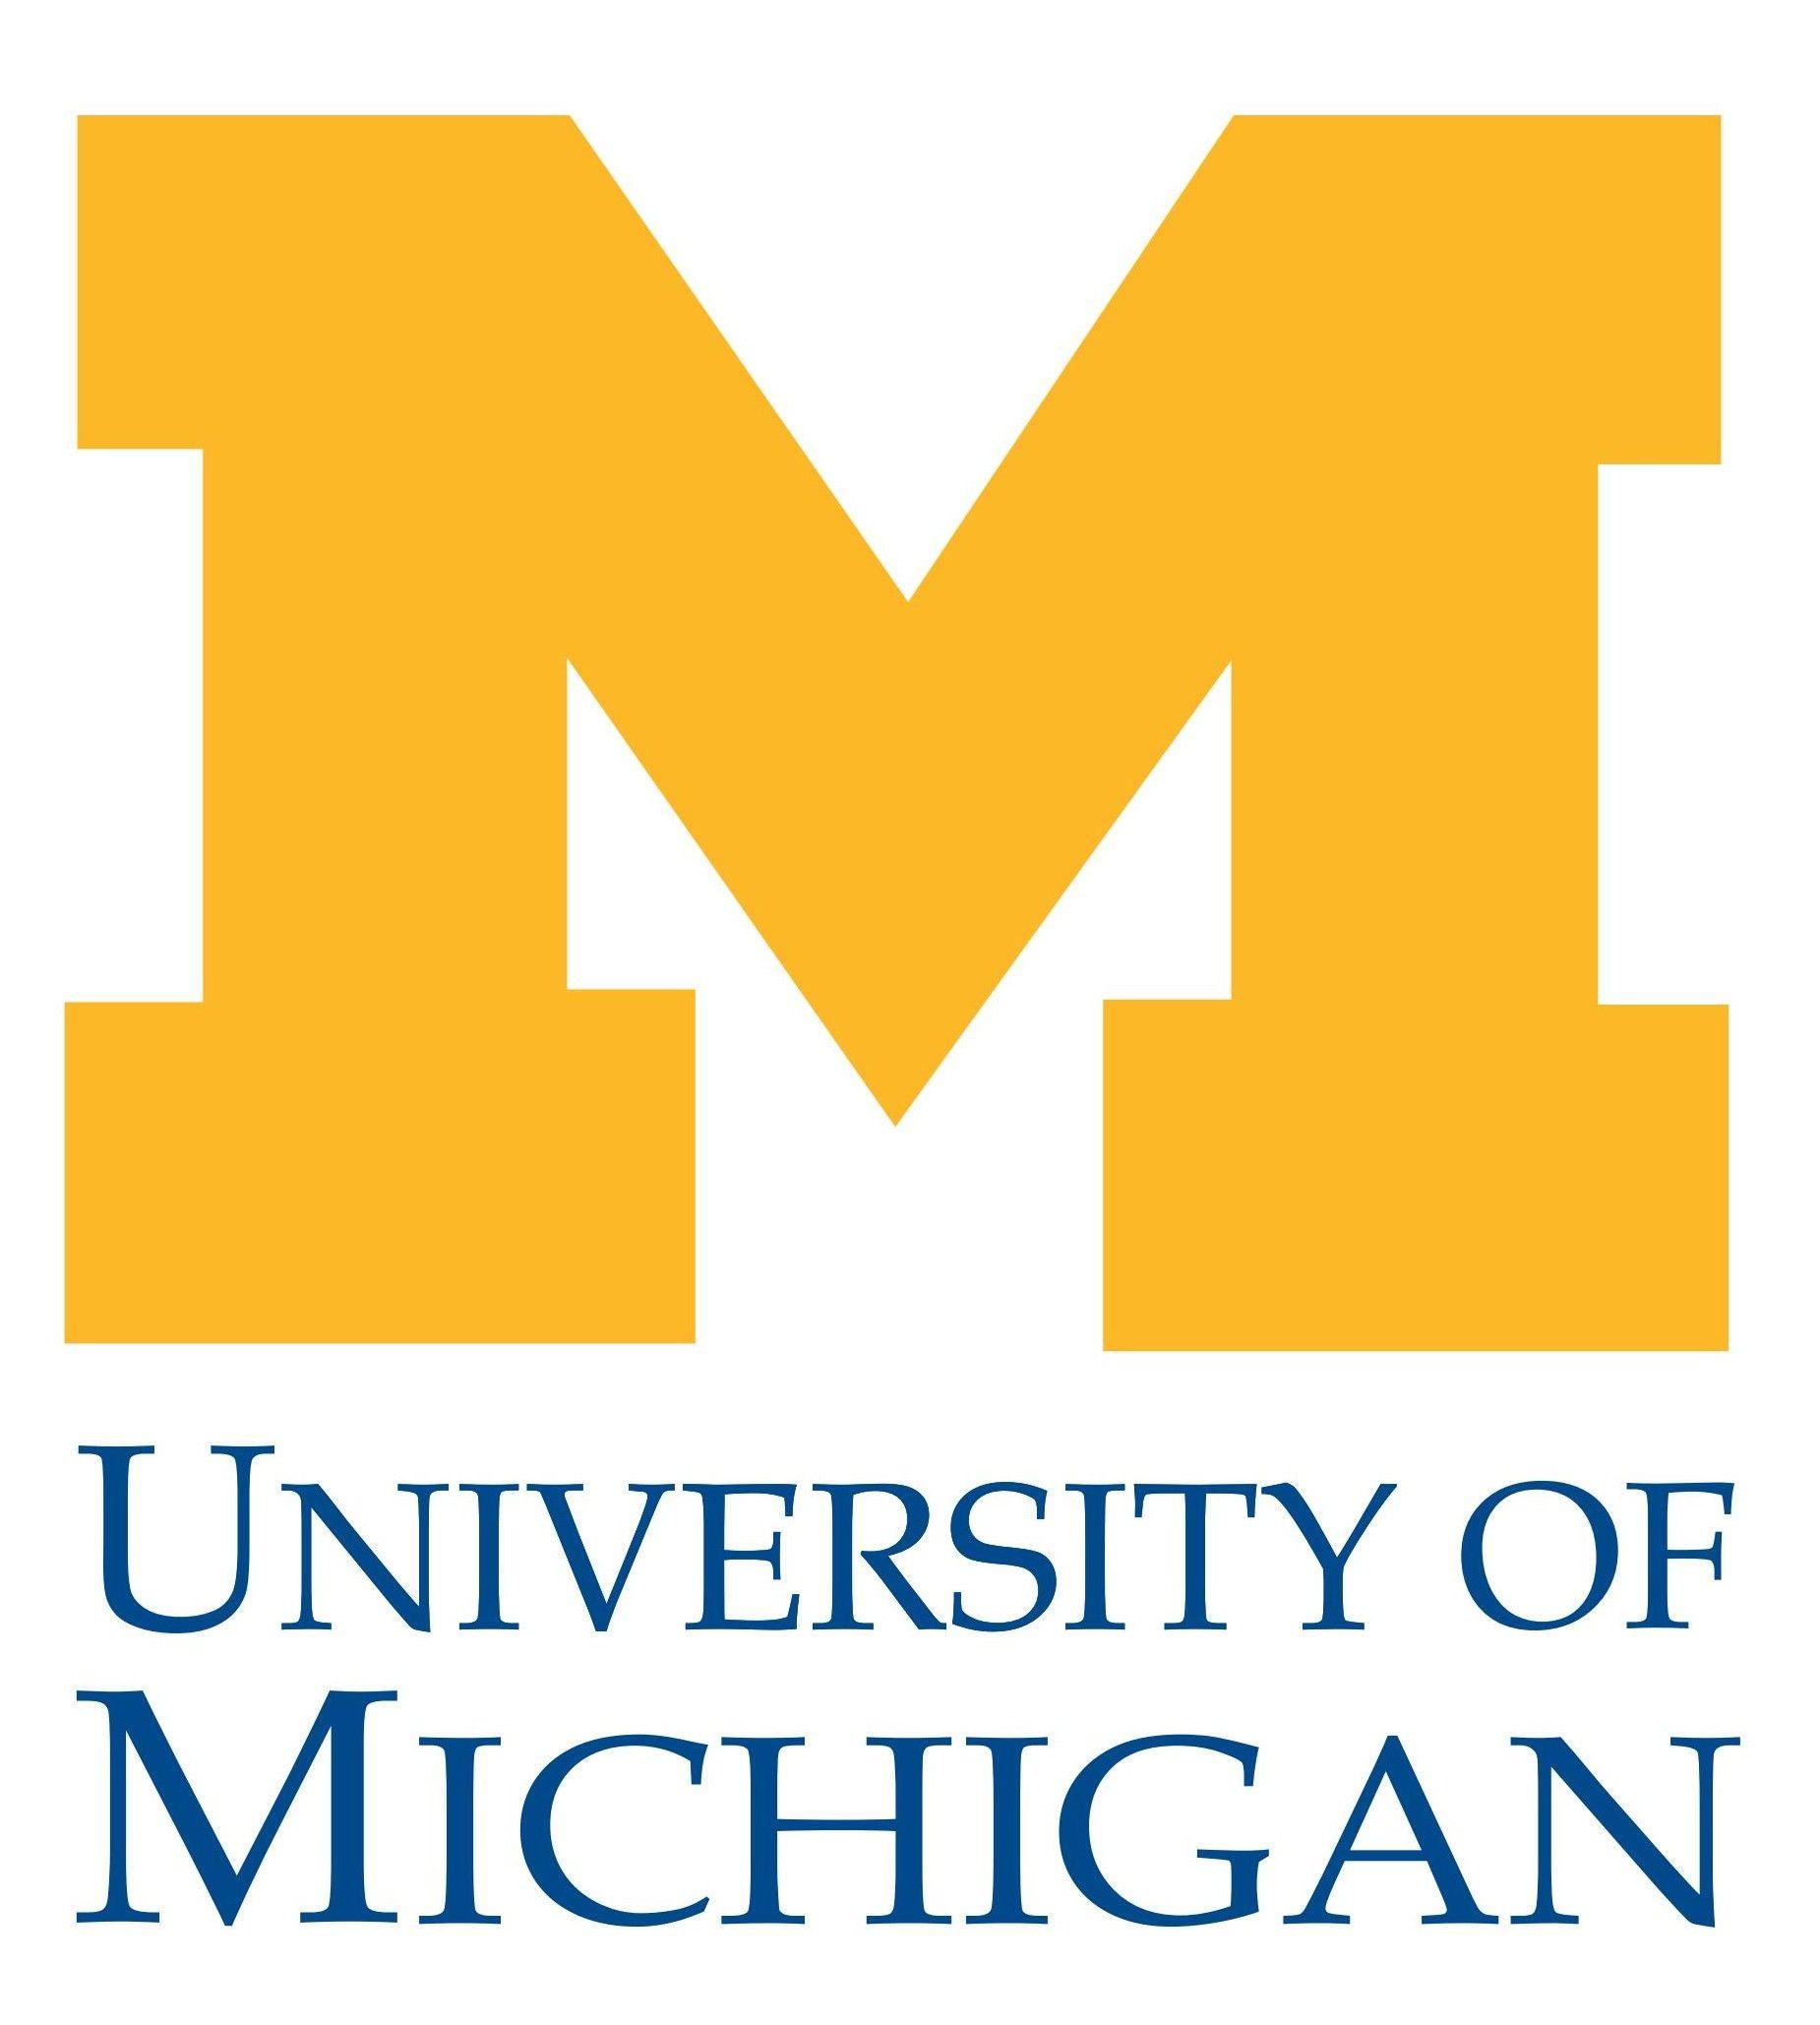 u m university of michigan arm eps pdf go blue university of rh pinterest com university of michigan logo download university of michigan logo eps